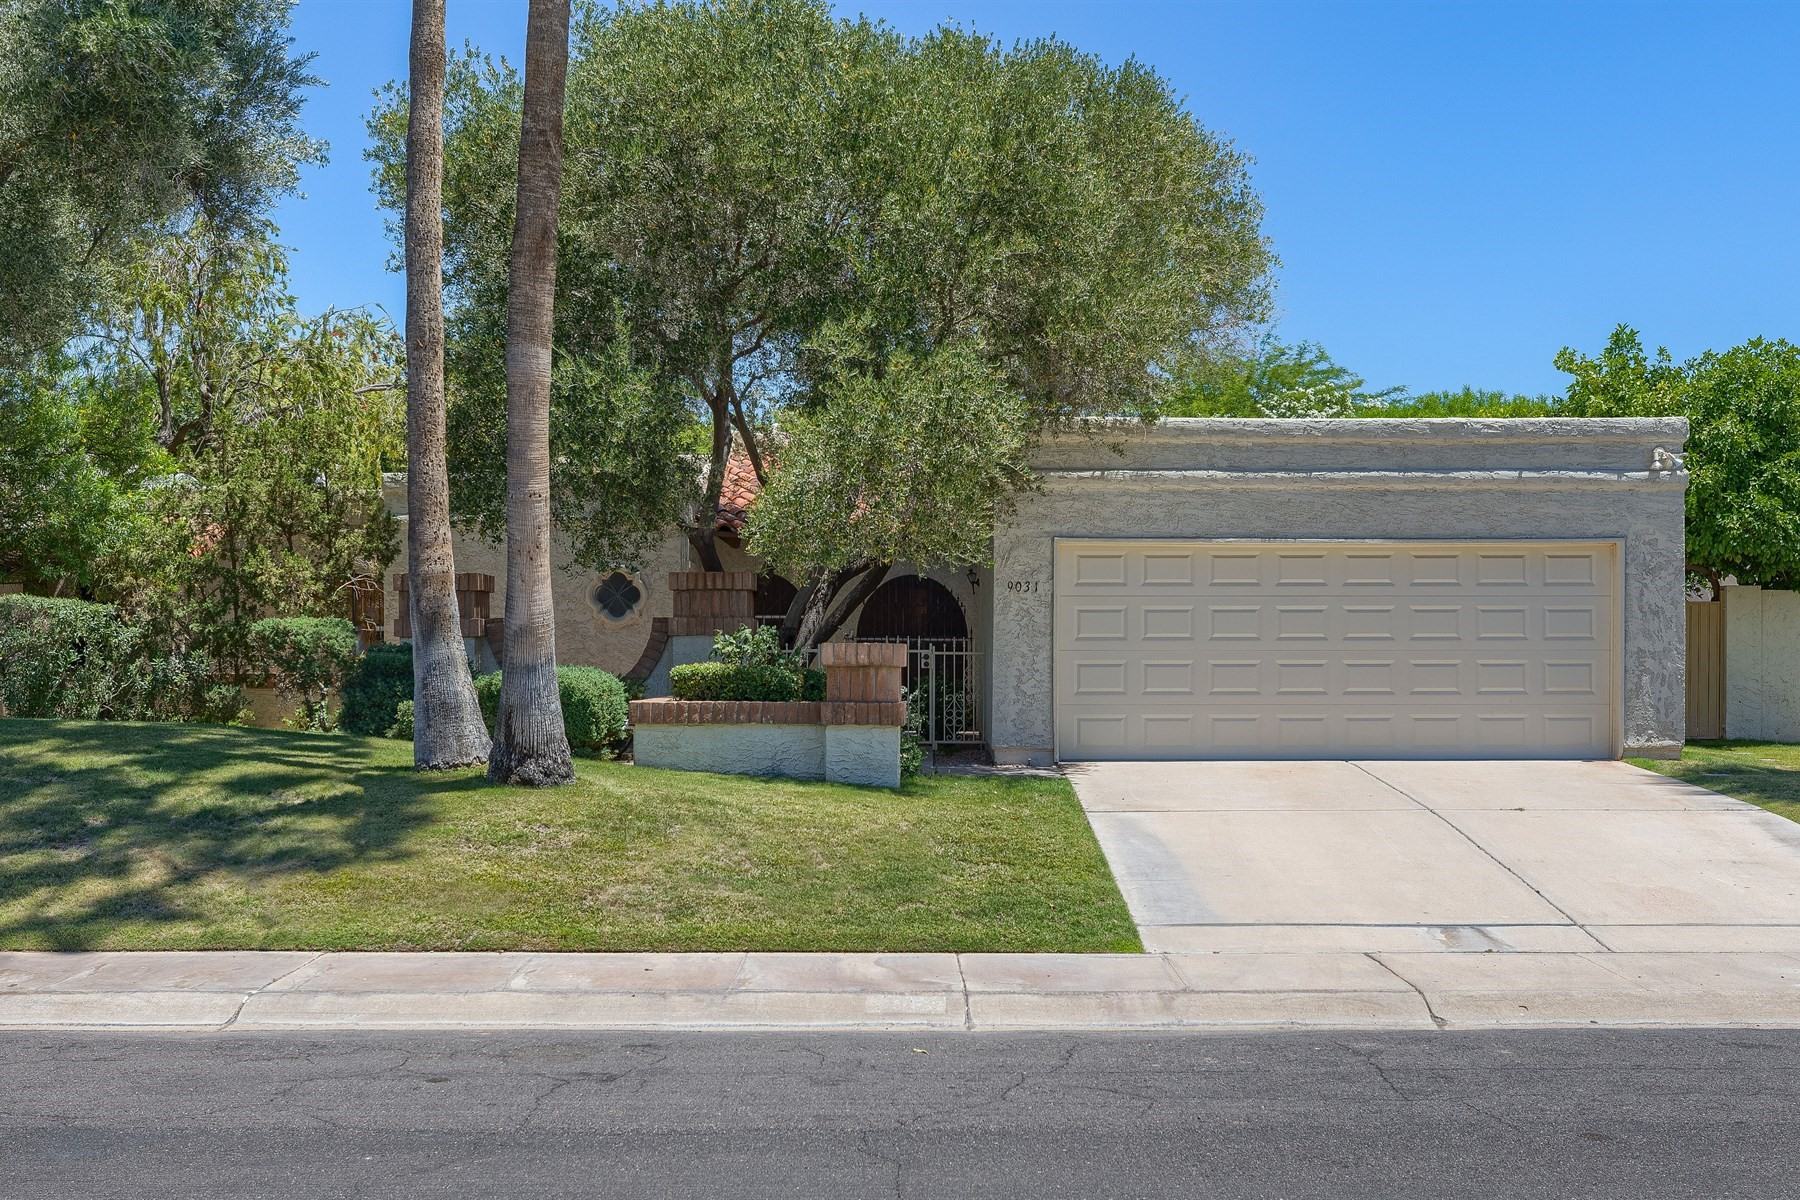 独户住宅 为 销售 在 Lovely private and popular neighborhood in Scottsdale 9031 N 87th Way 斯科茨代尔, 亚利桑那州, 85258 美国